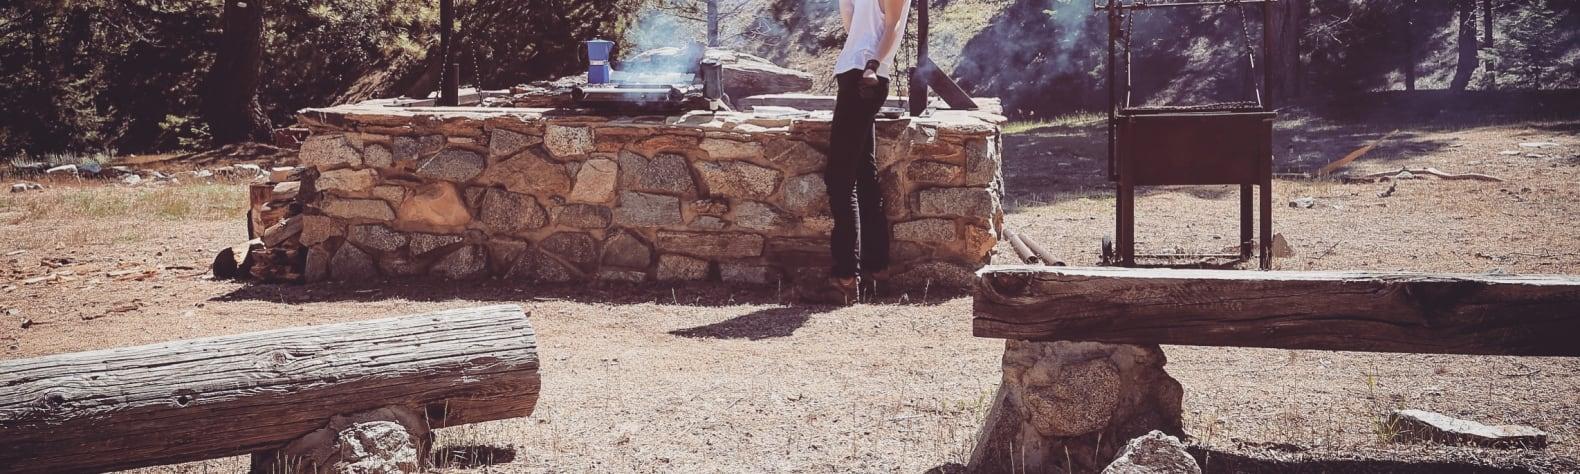 Antelope Canyon Ranch